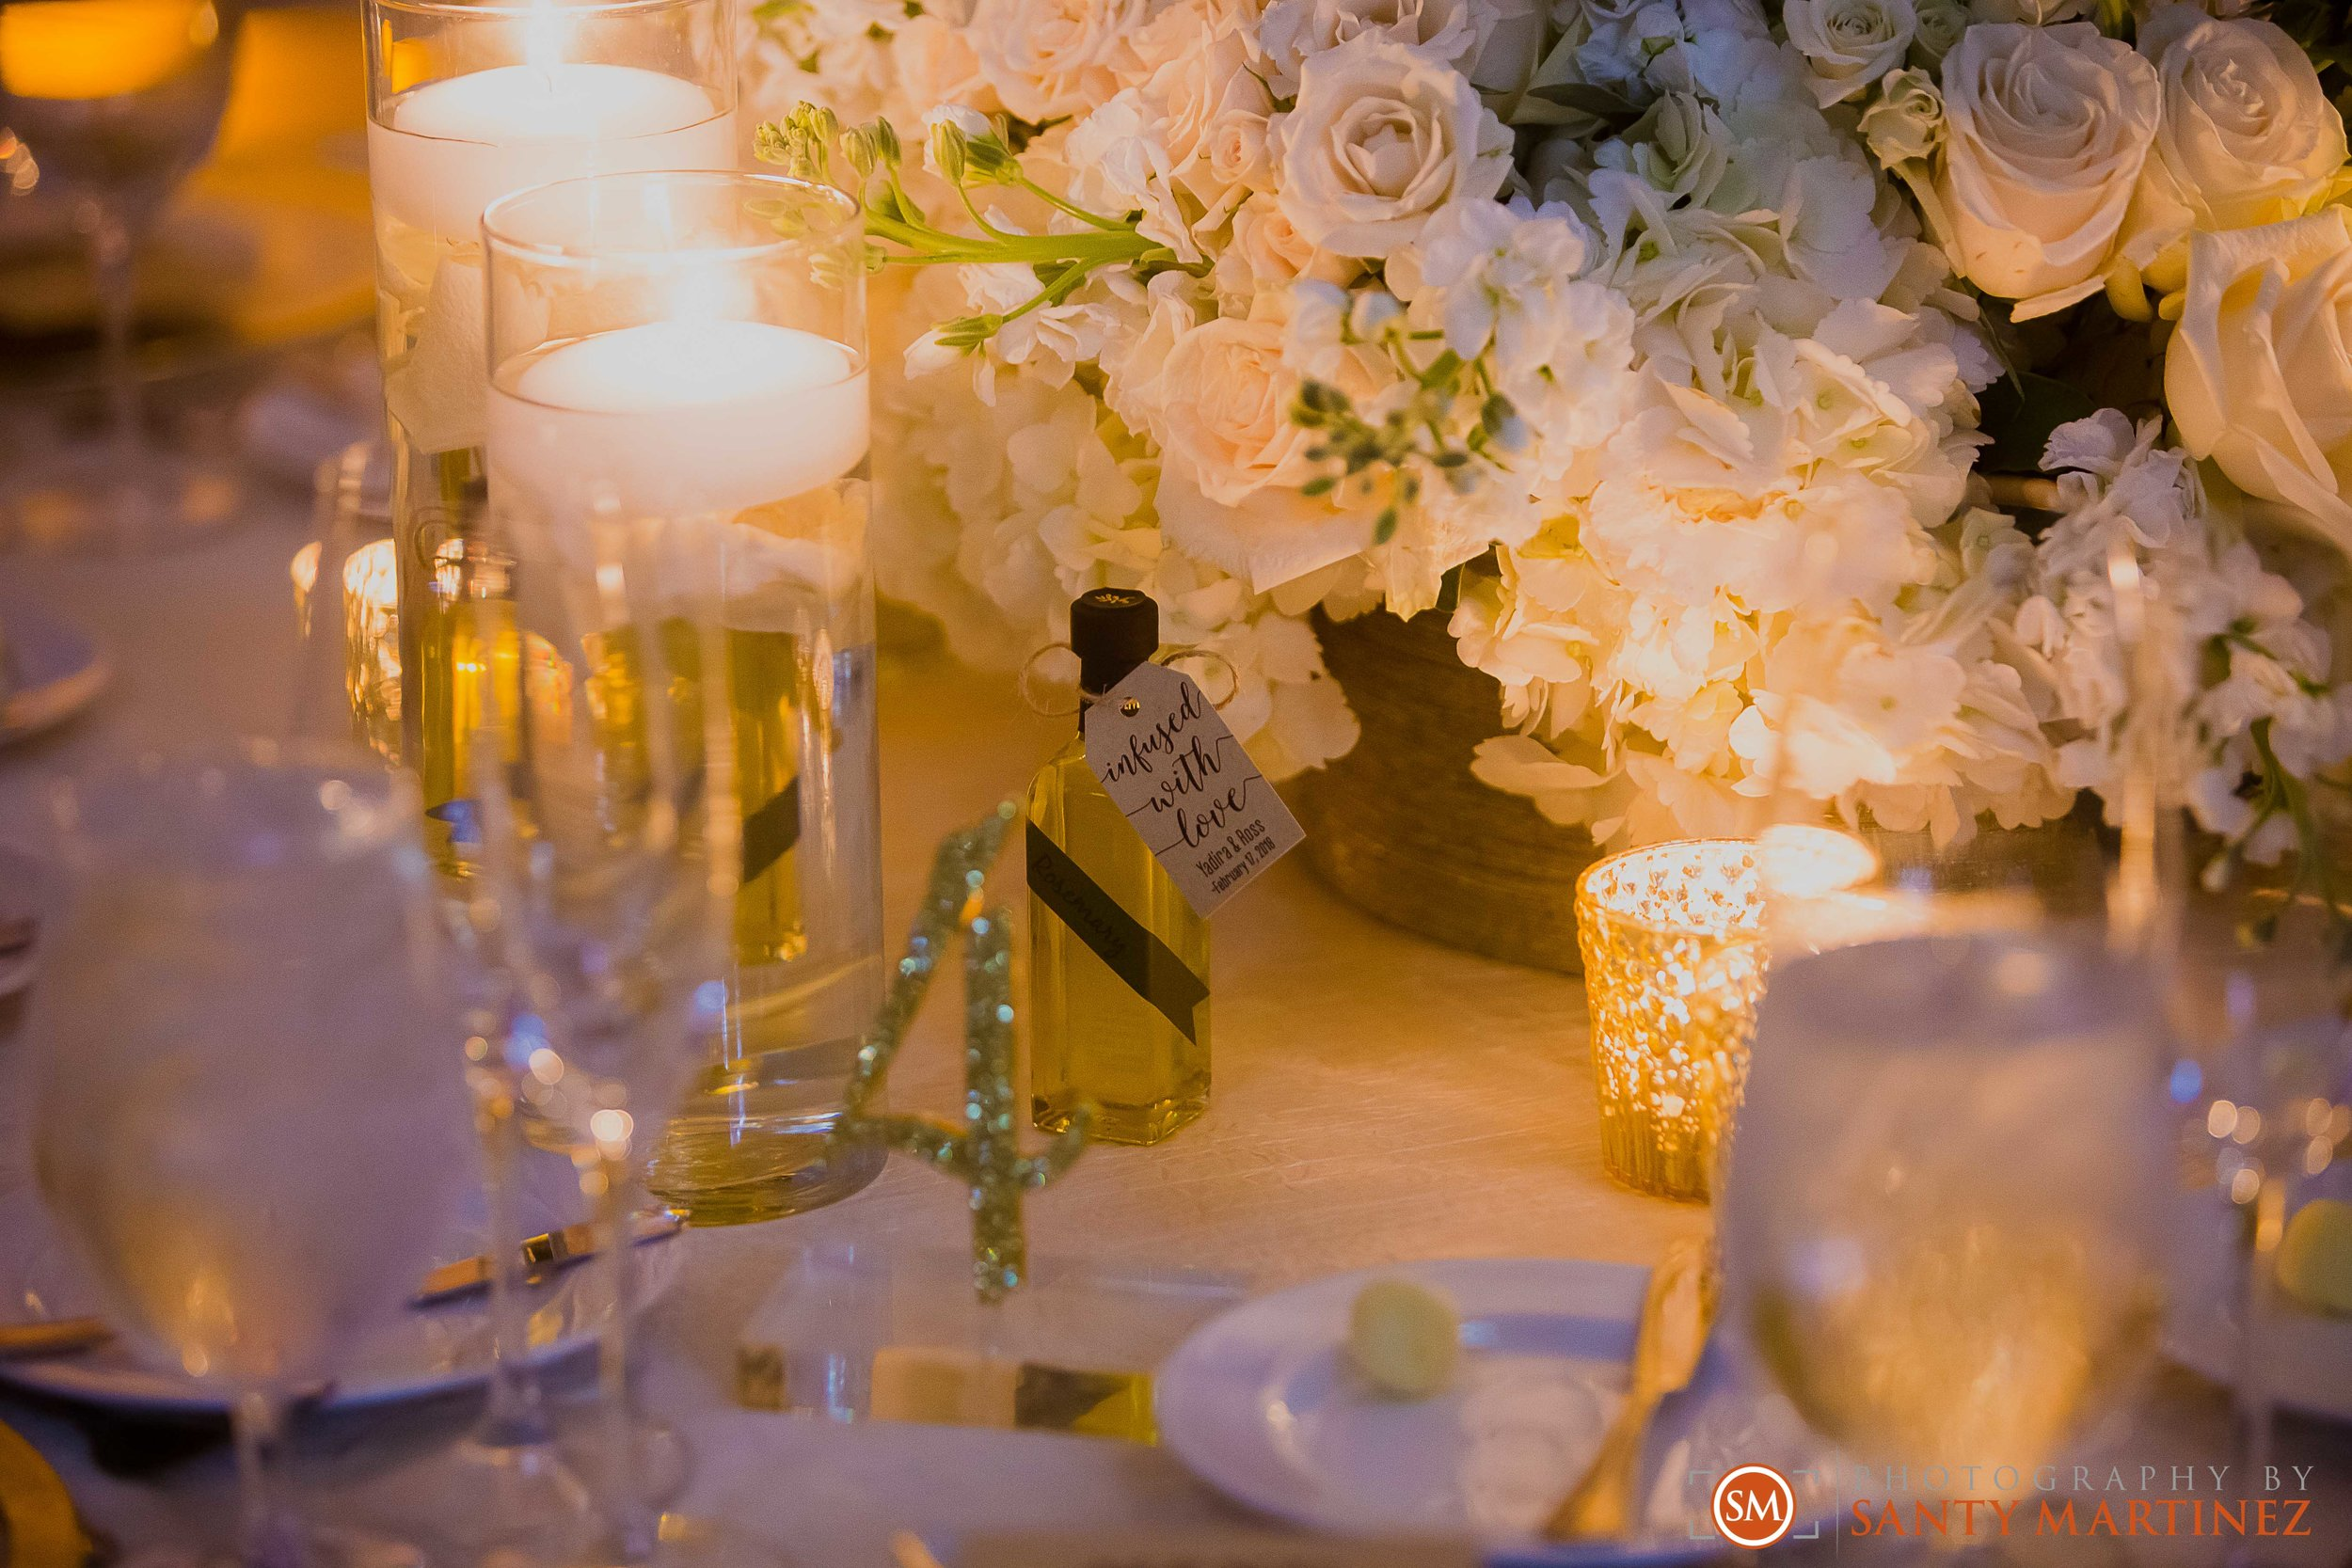 Wedding Coral Gables Country Club - Santy Martinez Photography-30.jpg